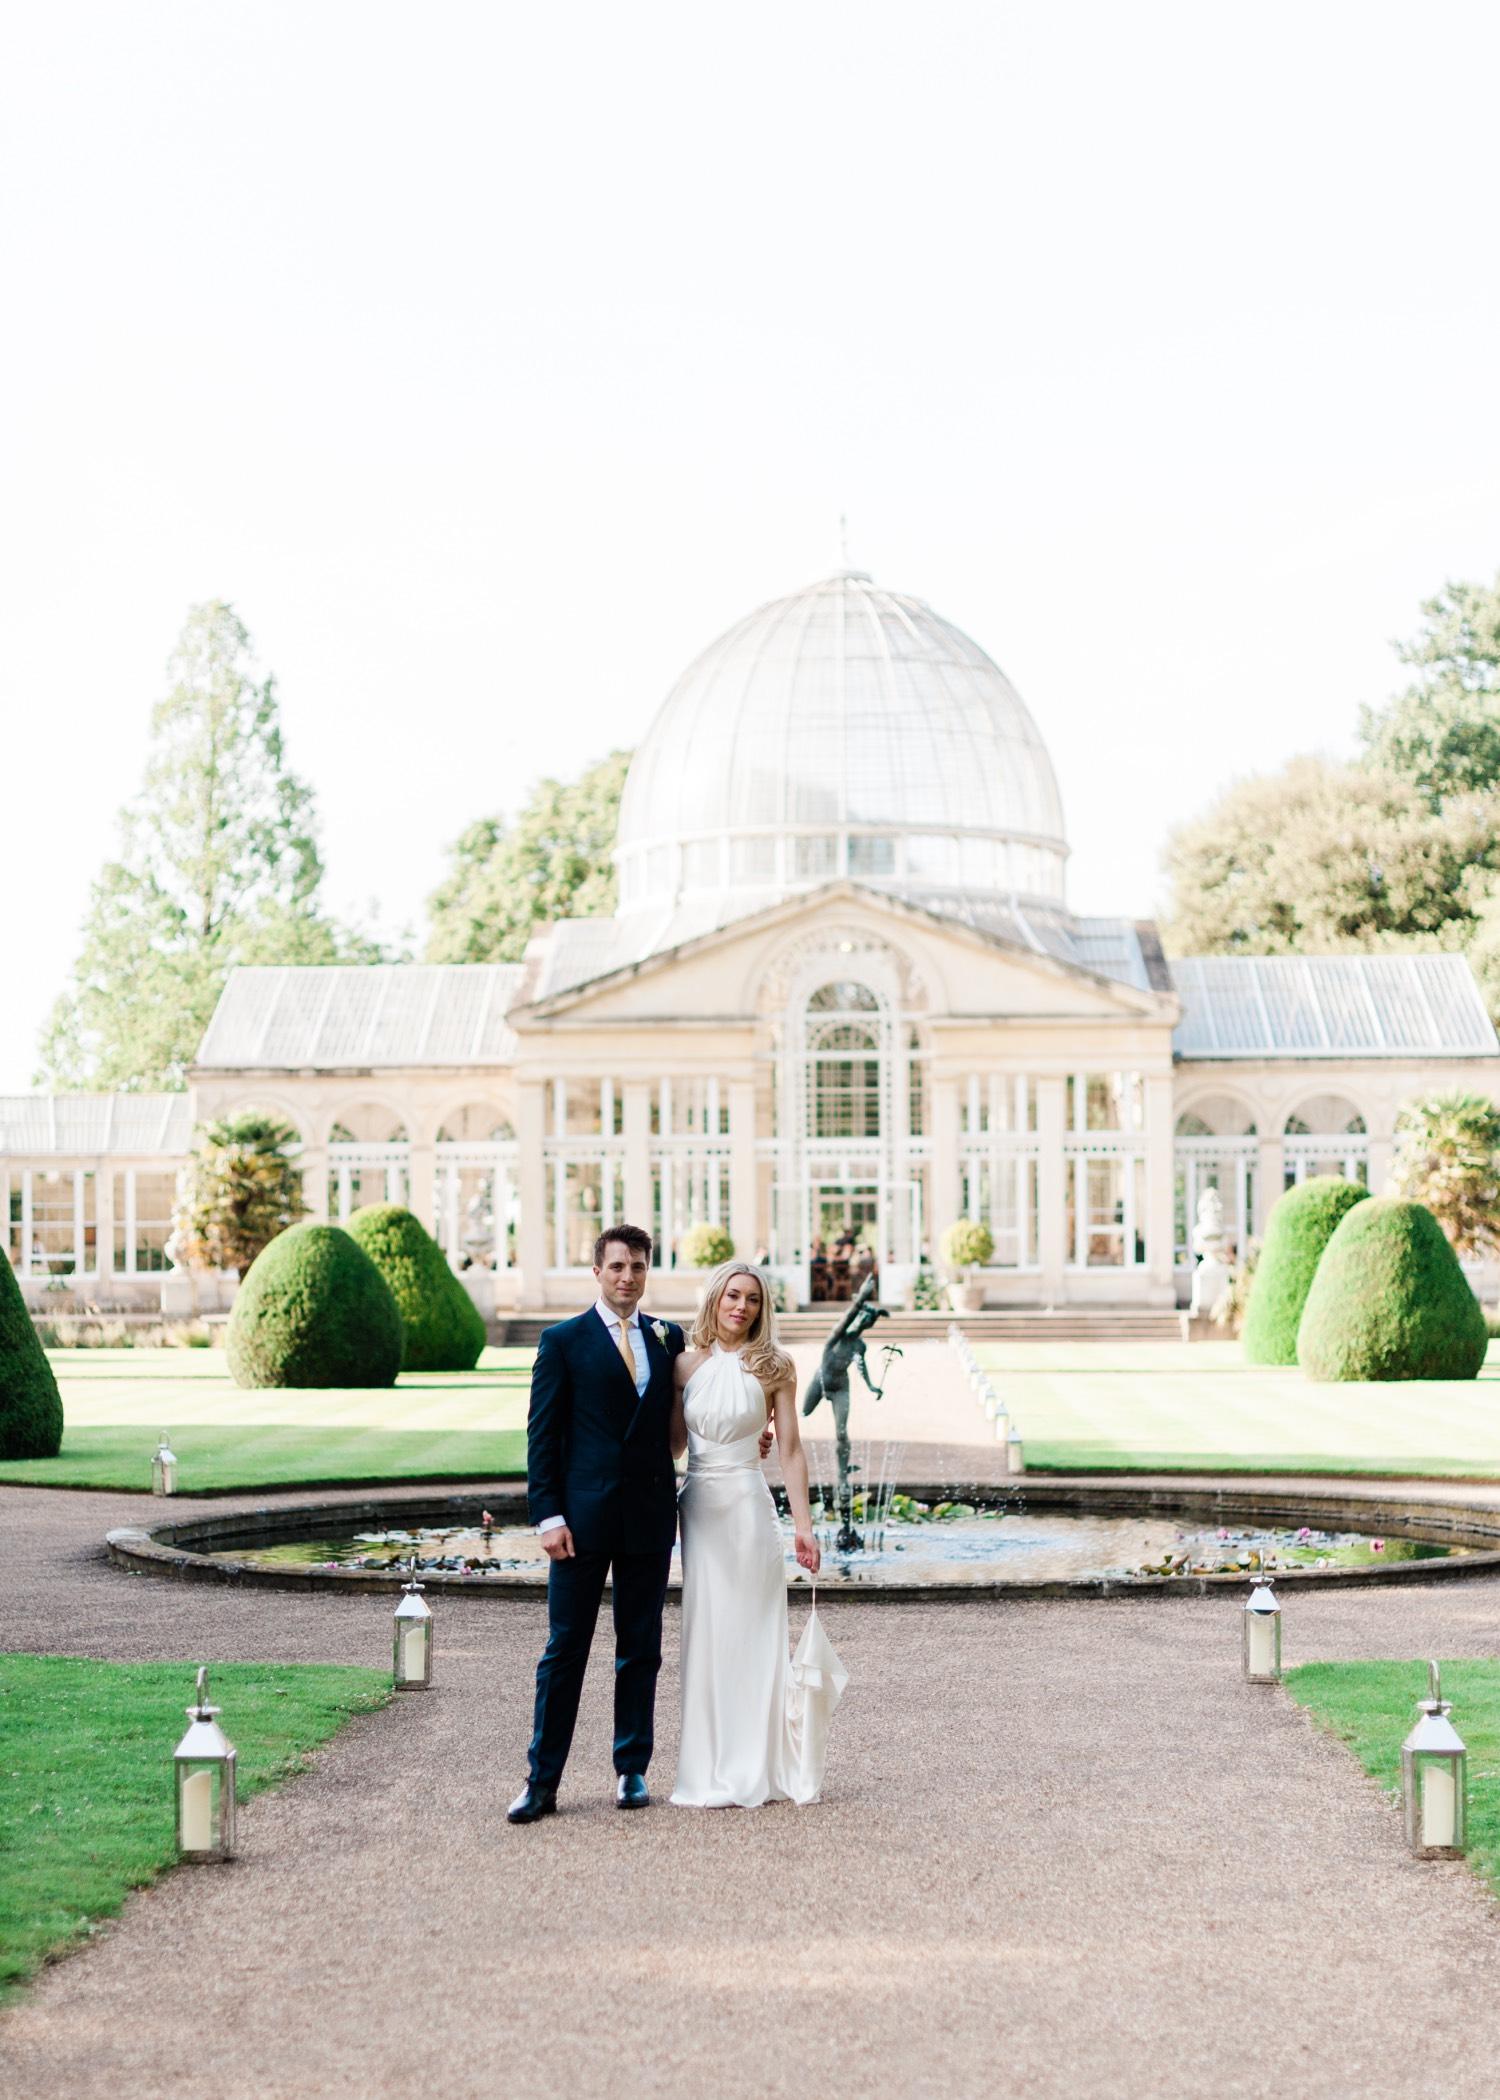 Littleton-Rose-Syon-House-London-Wedding-Planner-Conservatory-Bride-and-Groom.jpg